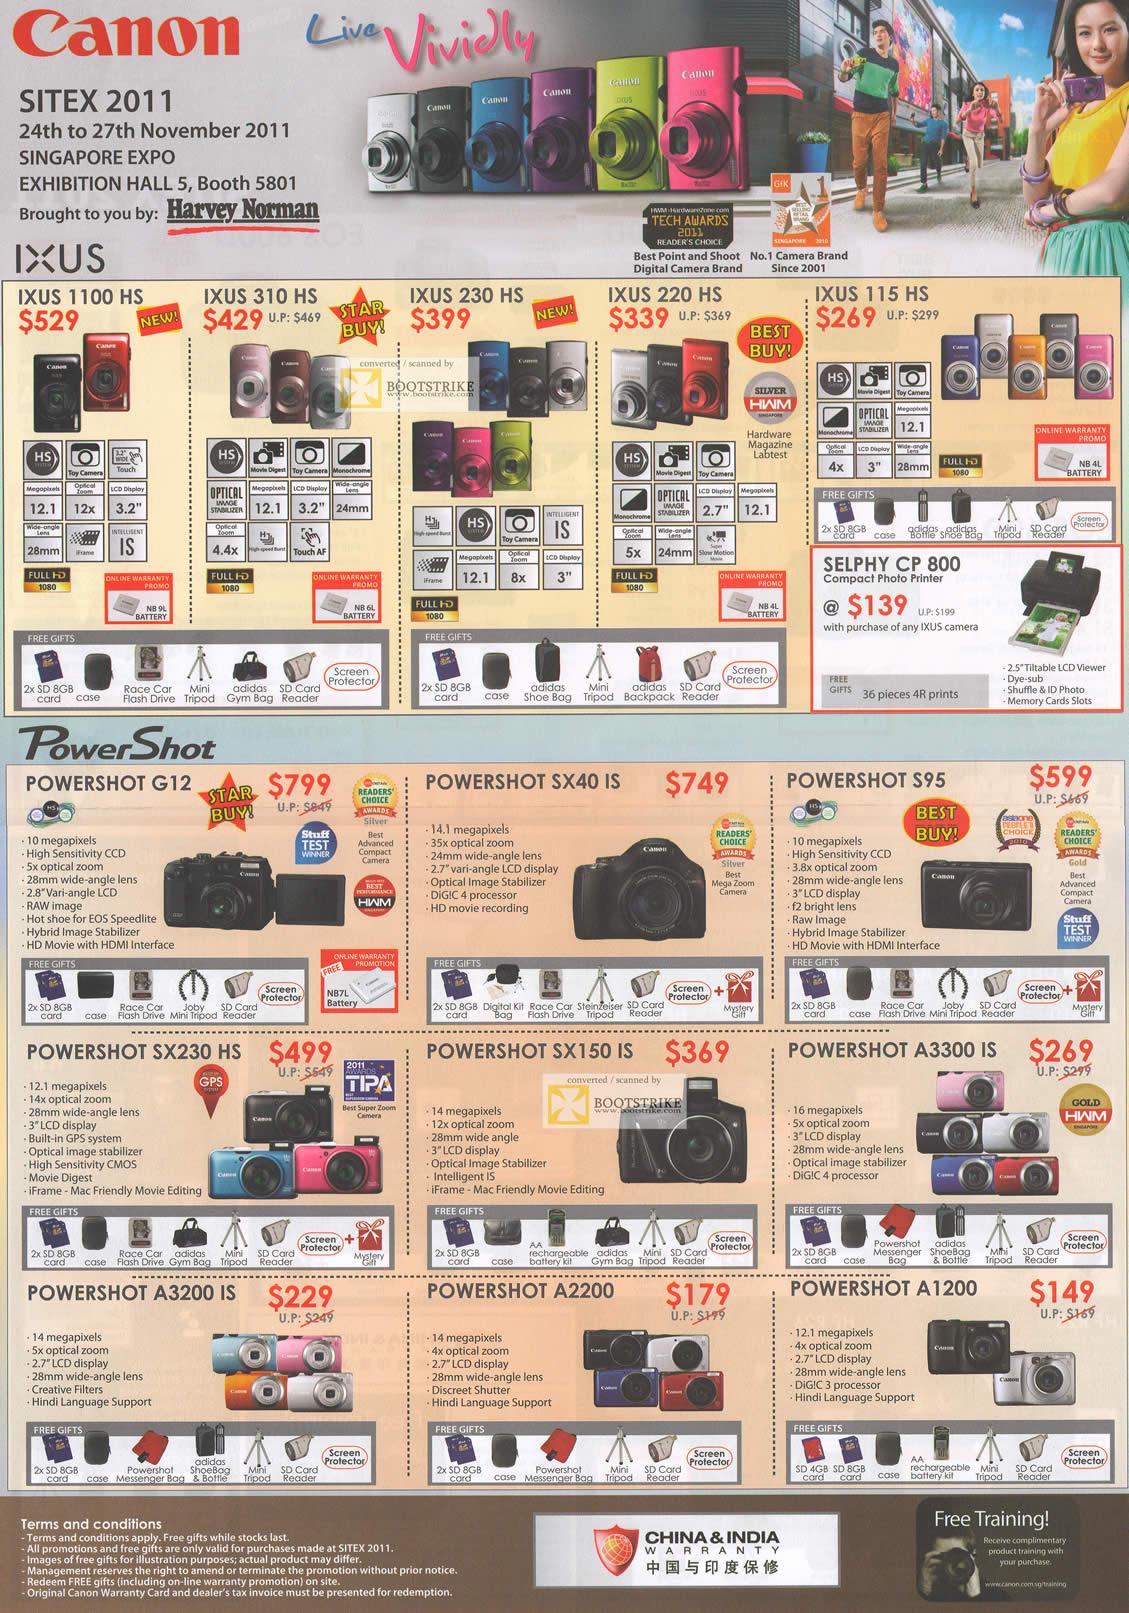 SITEX 2011 price list image brochure of Canon Digital Cameras IXUS 1100 HS, 310 HS, 230 HS, 220 HS, 115 HS, Selphy CP 800, PowerShot G12, SX40 IS, S95, SX230 HS, SX150 IS, A3300 IS, A3200 IS, A2200, A1200